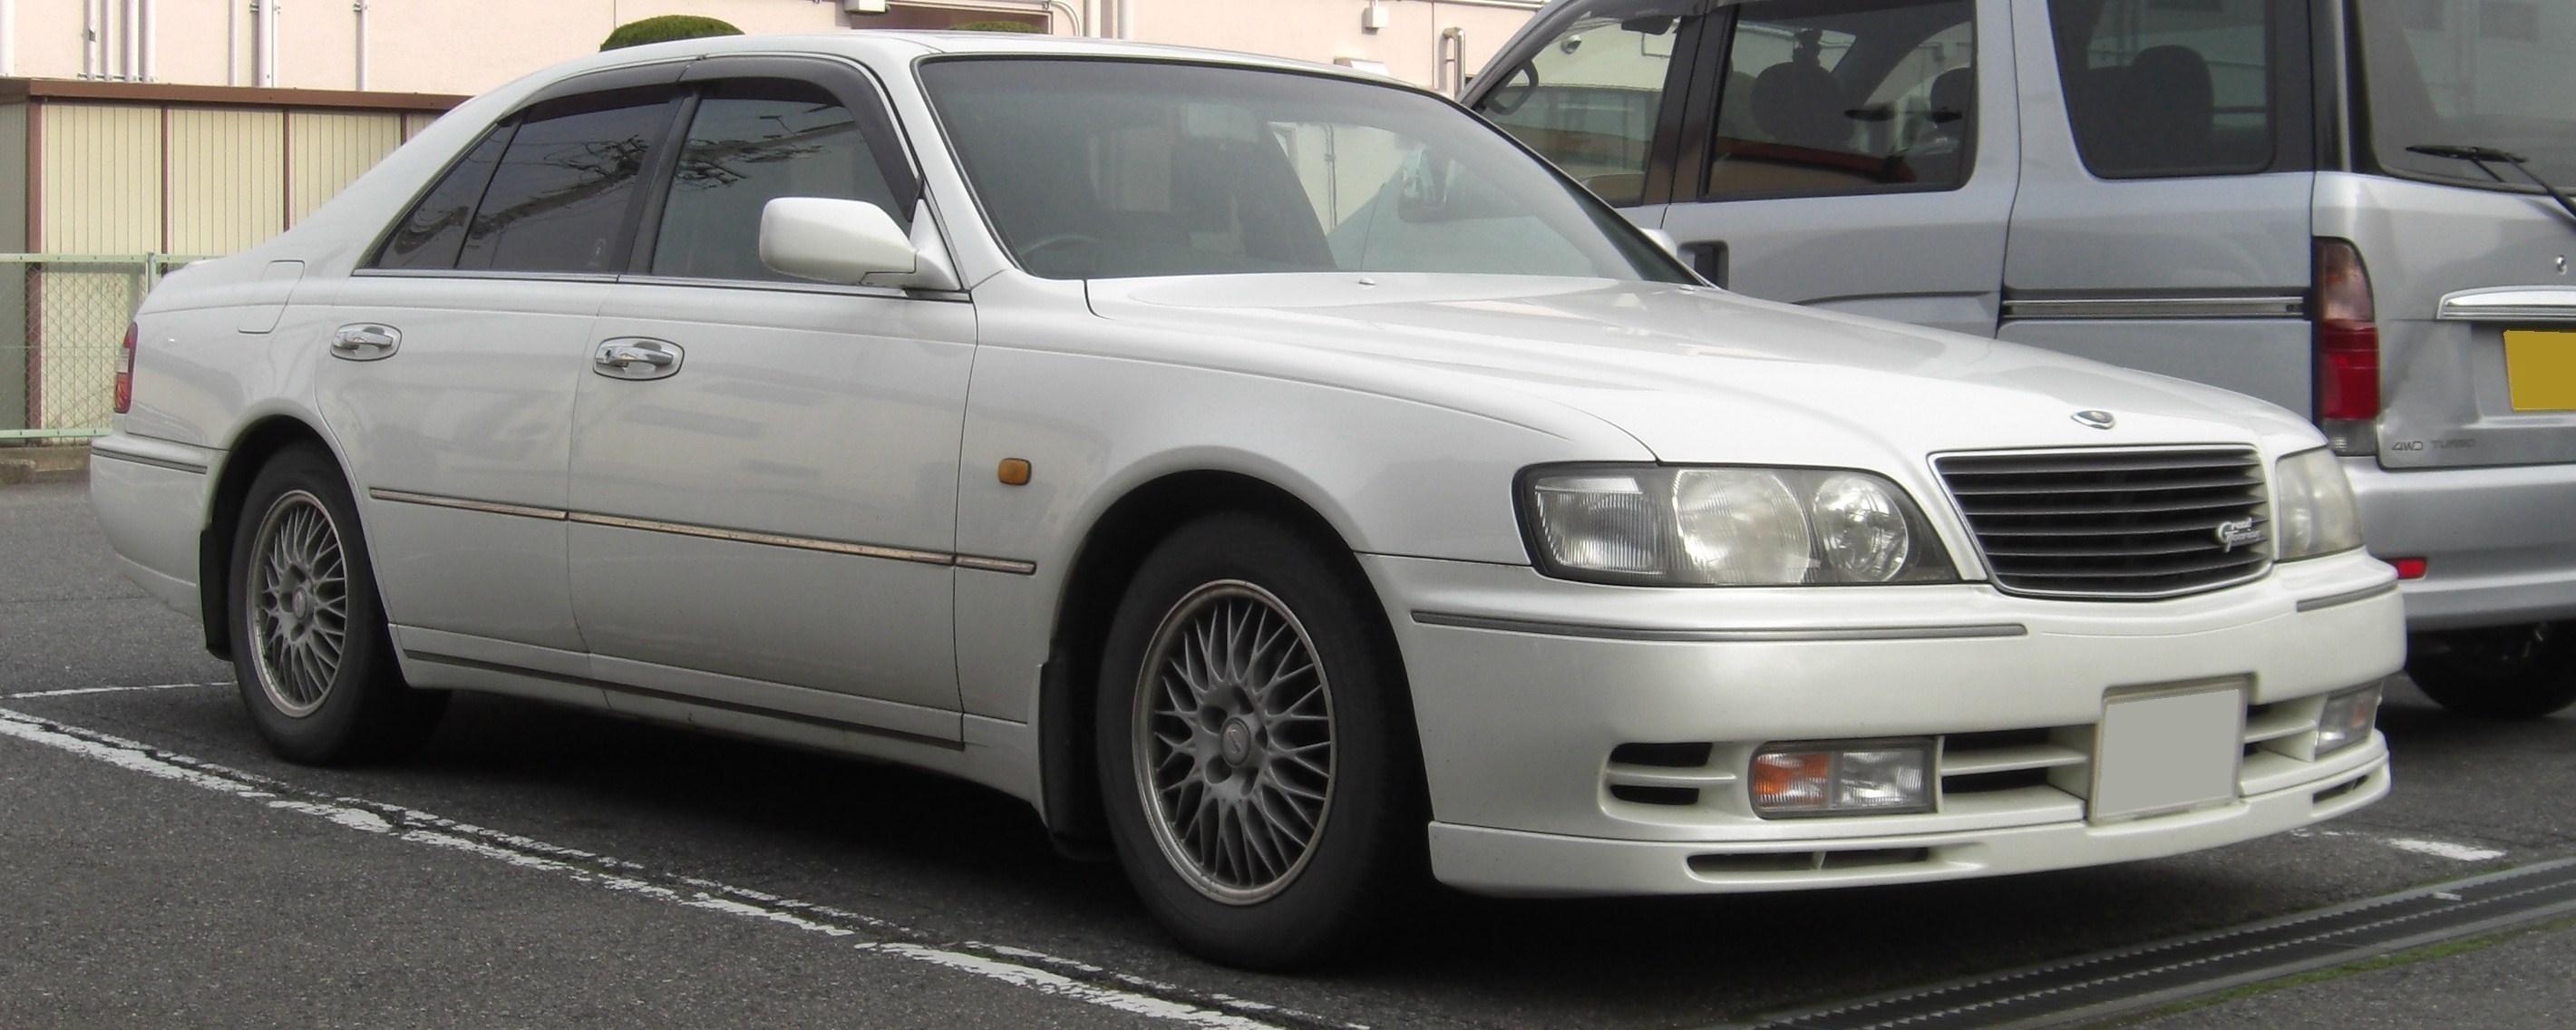 Nissan Cima I (Y31) 1988 - 1991 Sedan-Hardtop #1